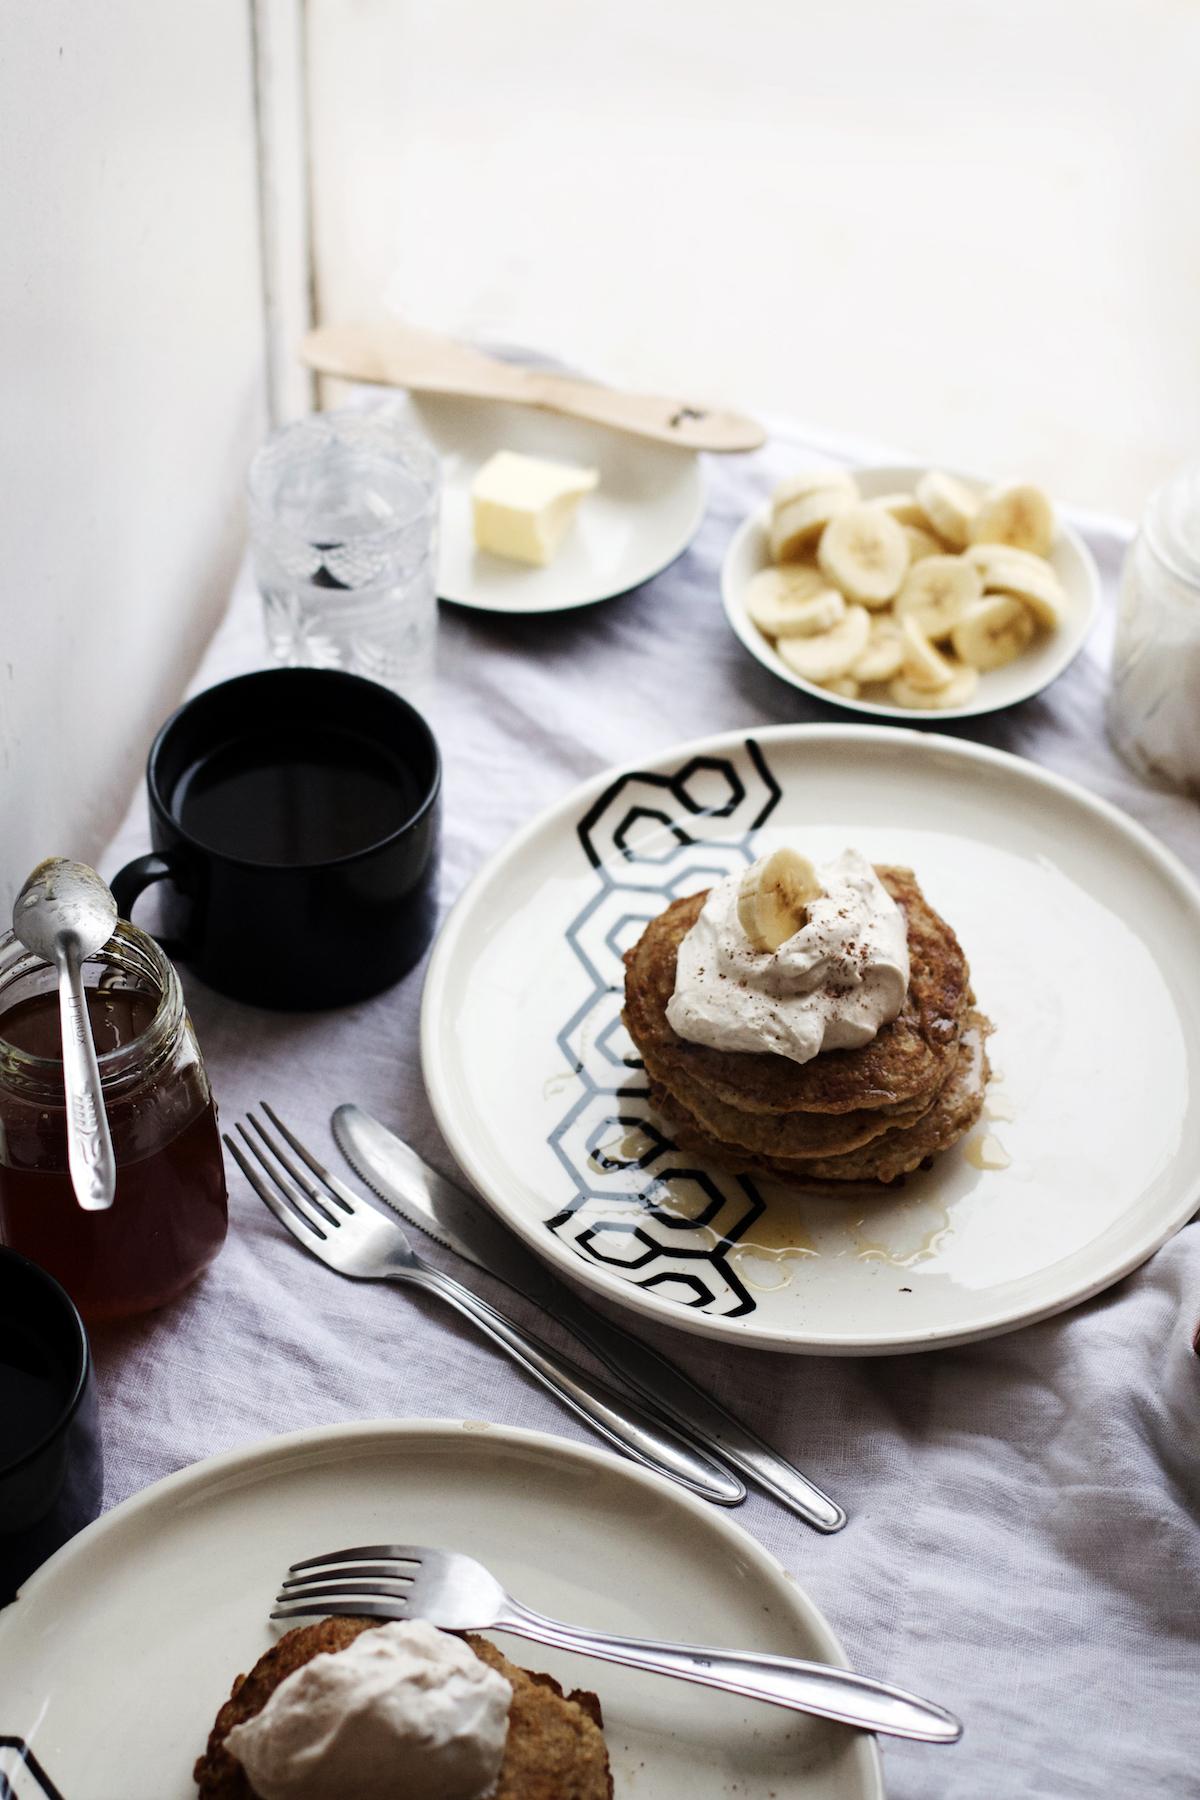 Brown Butter Banana Oatmeal Pancakes w/ Peanut Butter Whipped Cream + Honey (gluten-free + refined sugar free) | Ruby Josephine